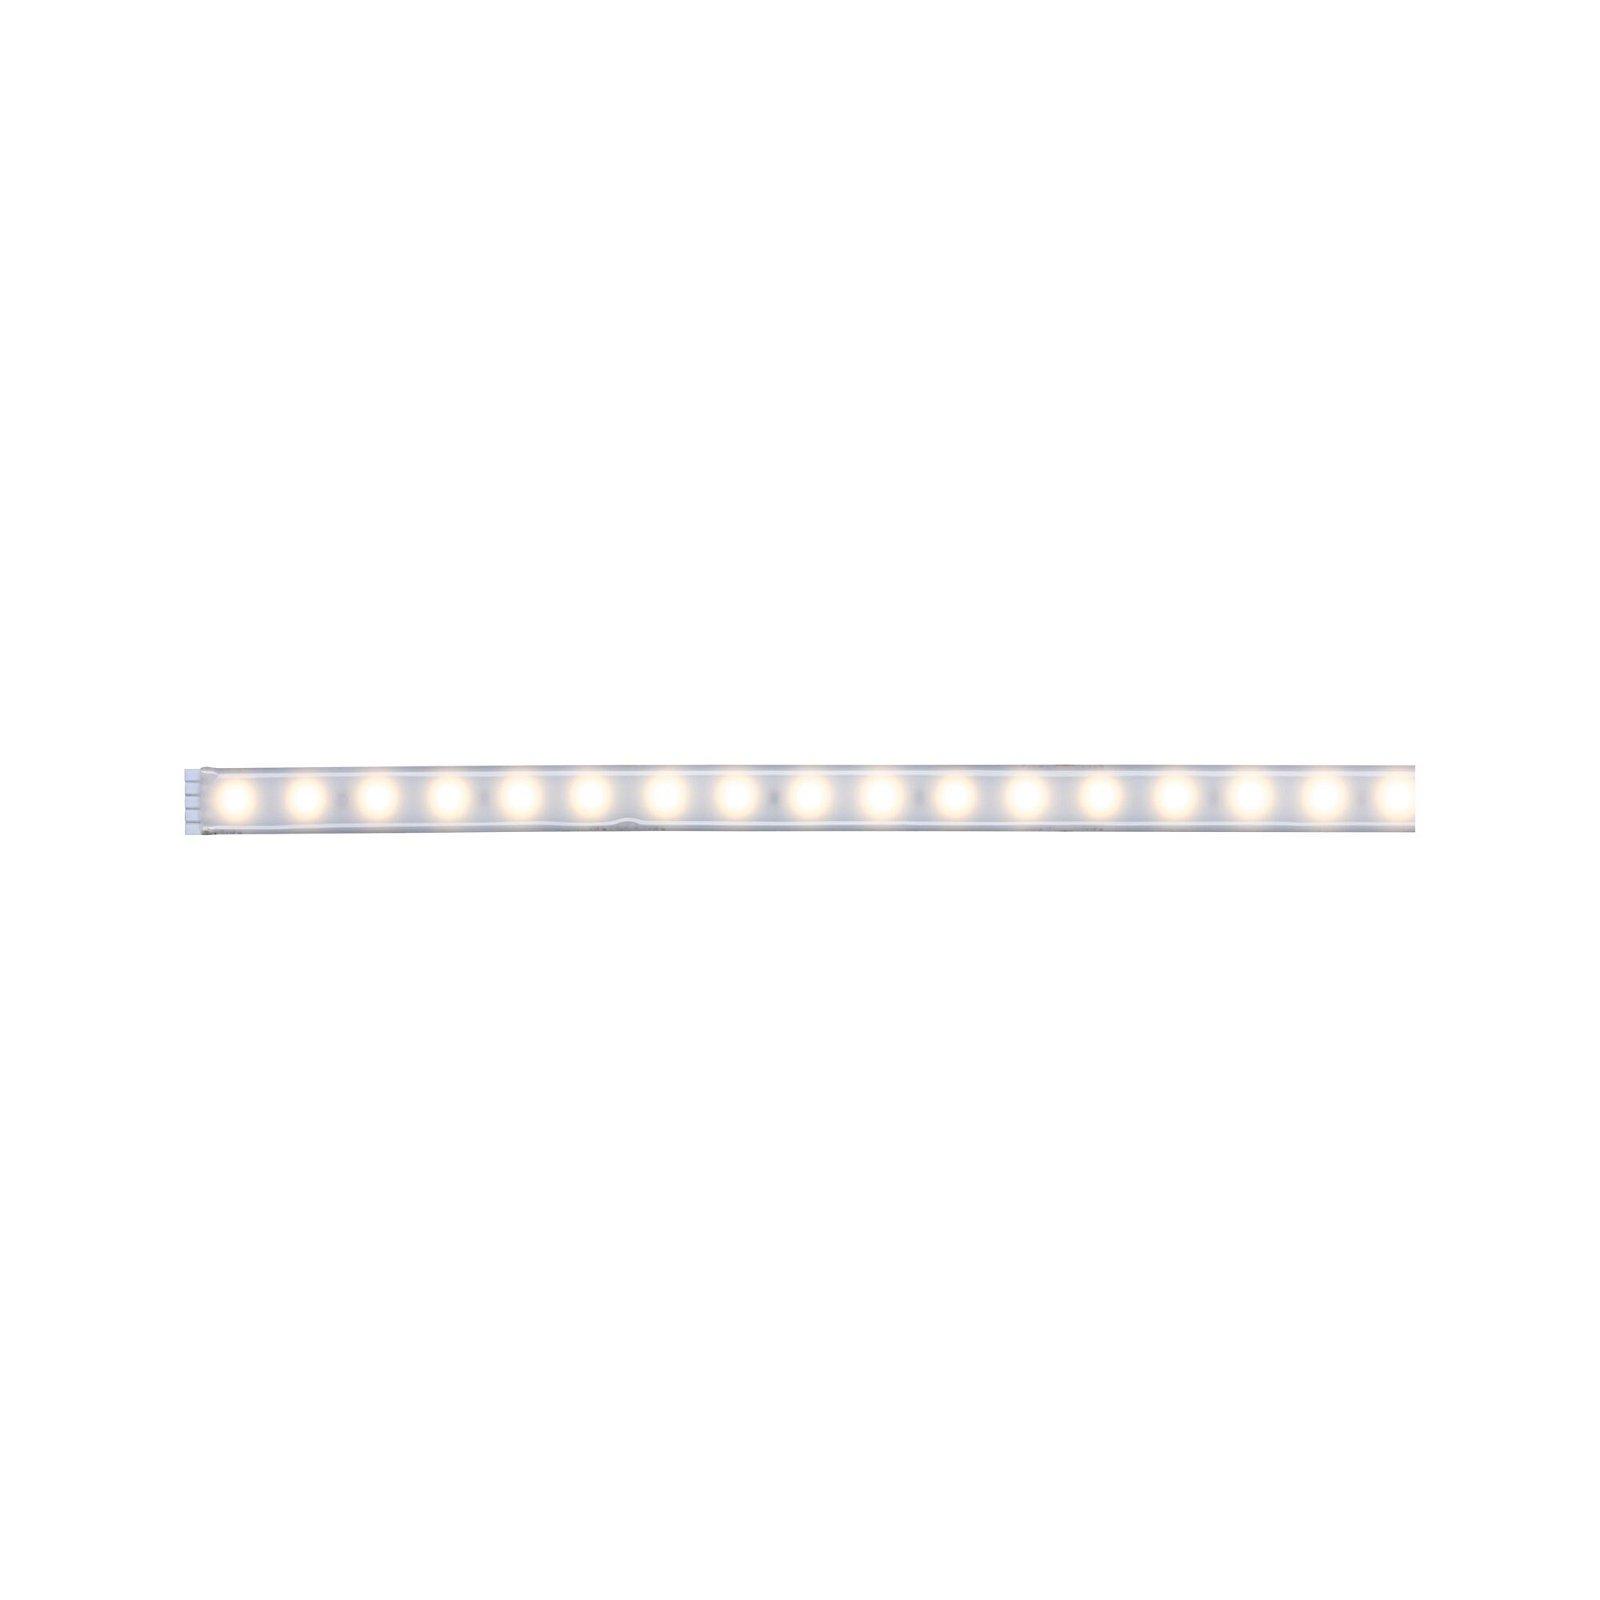 MaxLED 500 Strip LED Blanc chaud 1m recouvert 6W 550lm 2700K